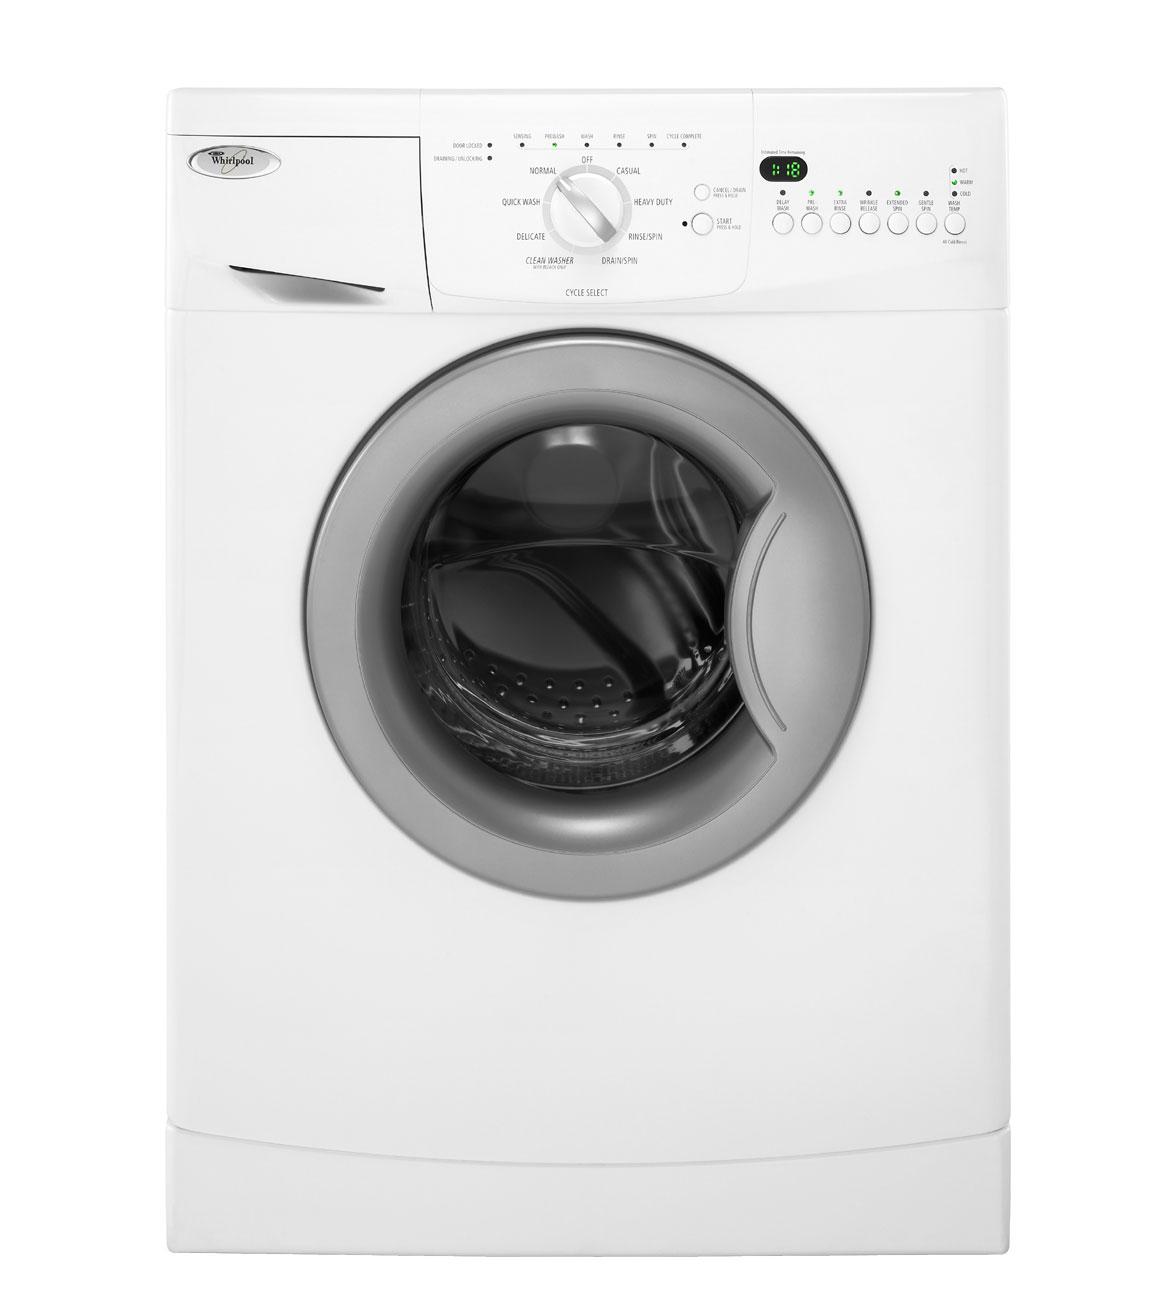 Manual Raeder: Whirlpool WFC7500VW Washer Service Manual